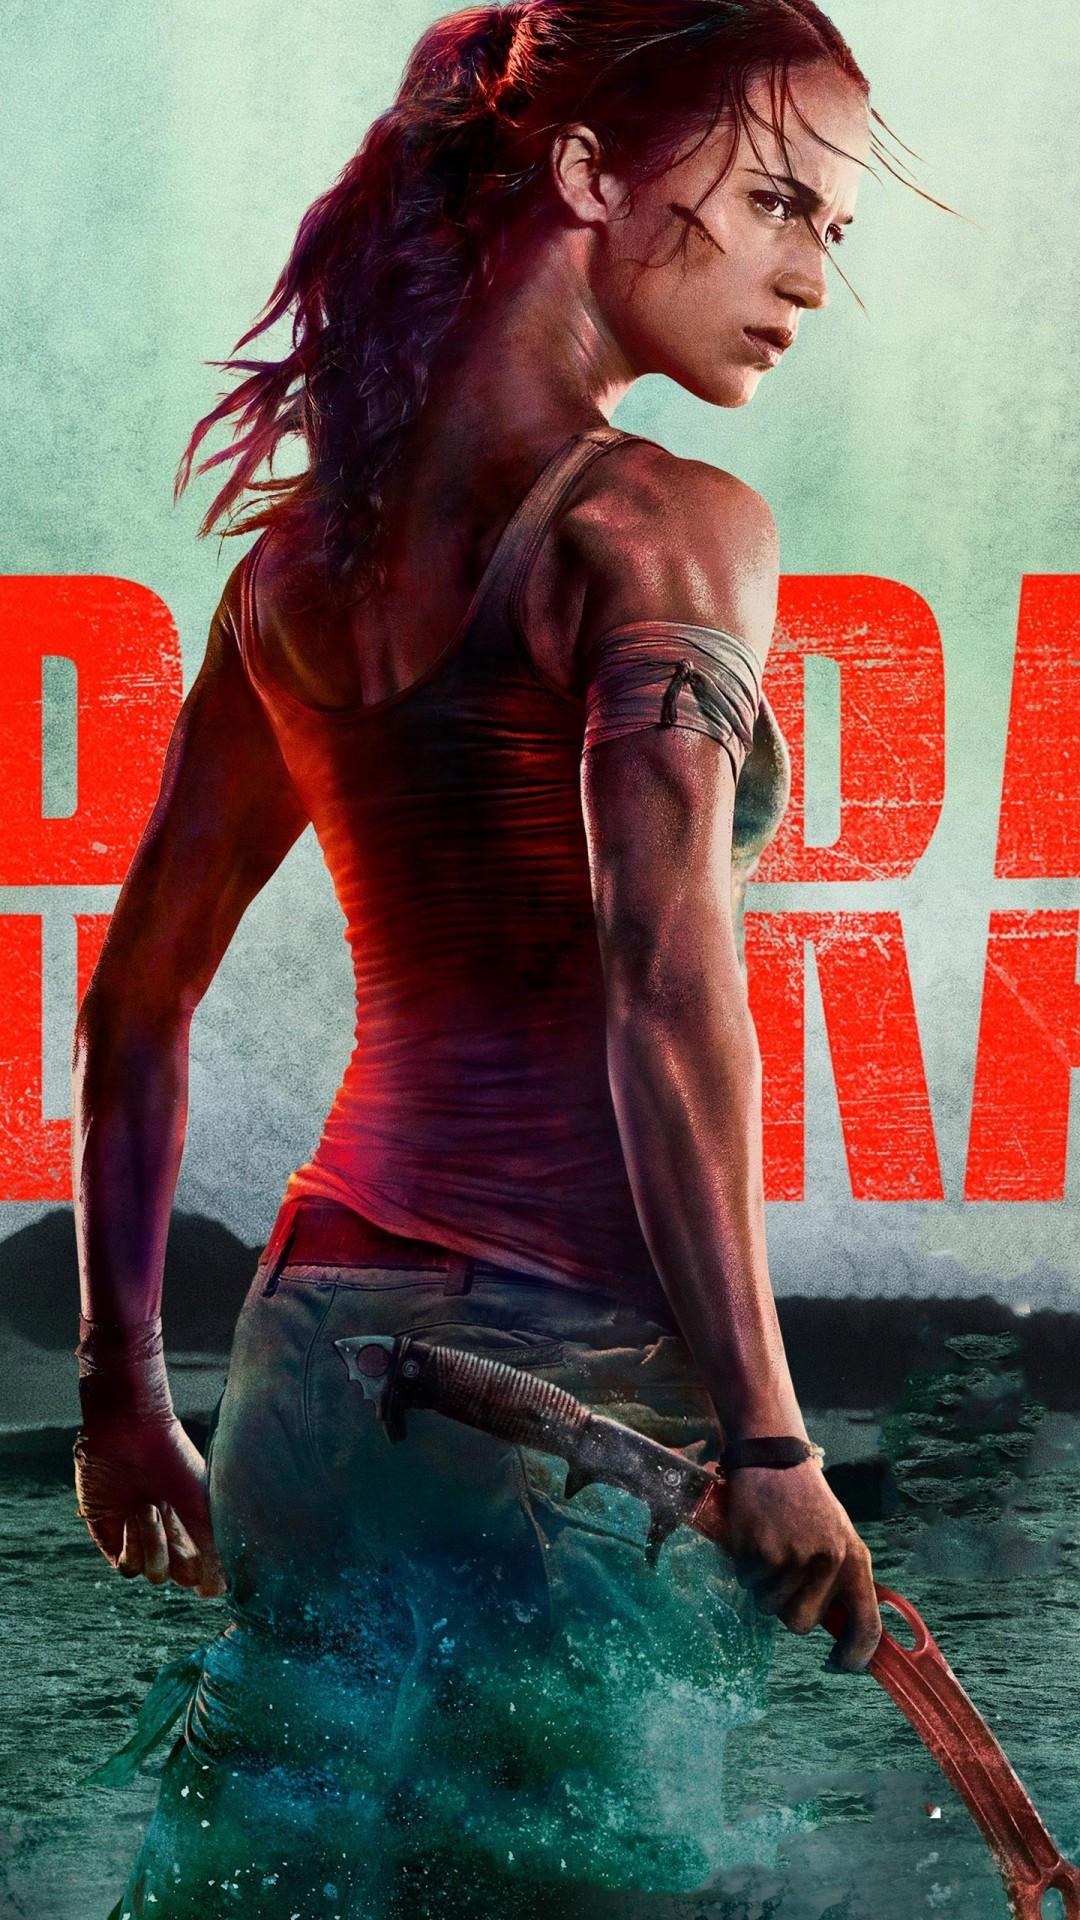 Tomb Raider 2018 HD Wallpaper ·① WallpaperTag  Tomb Raider 201...